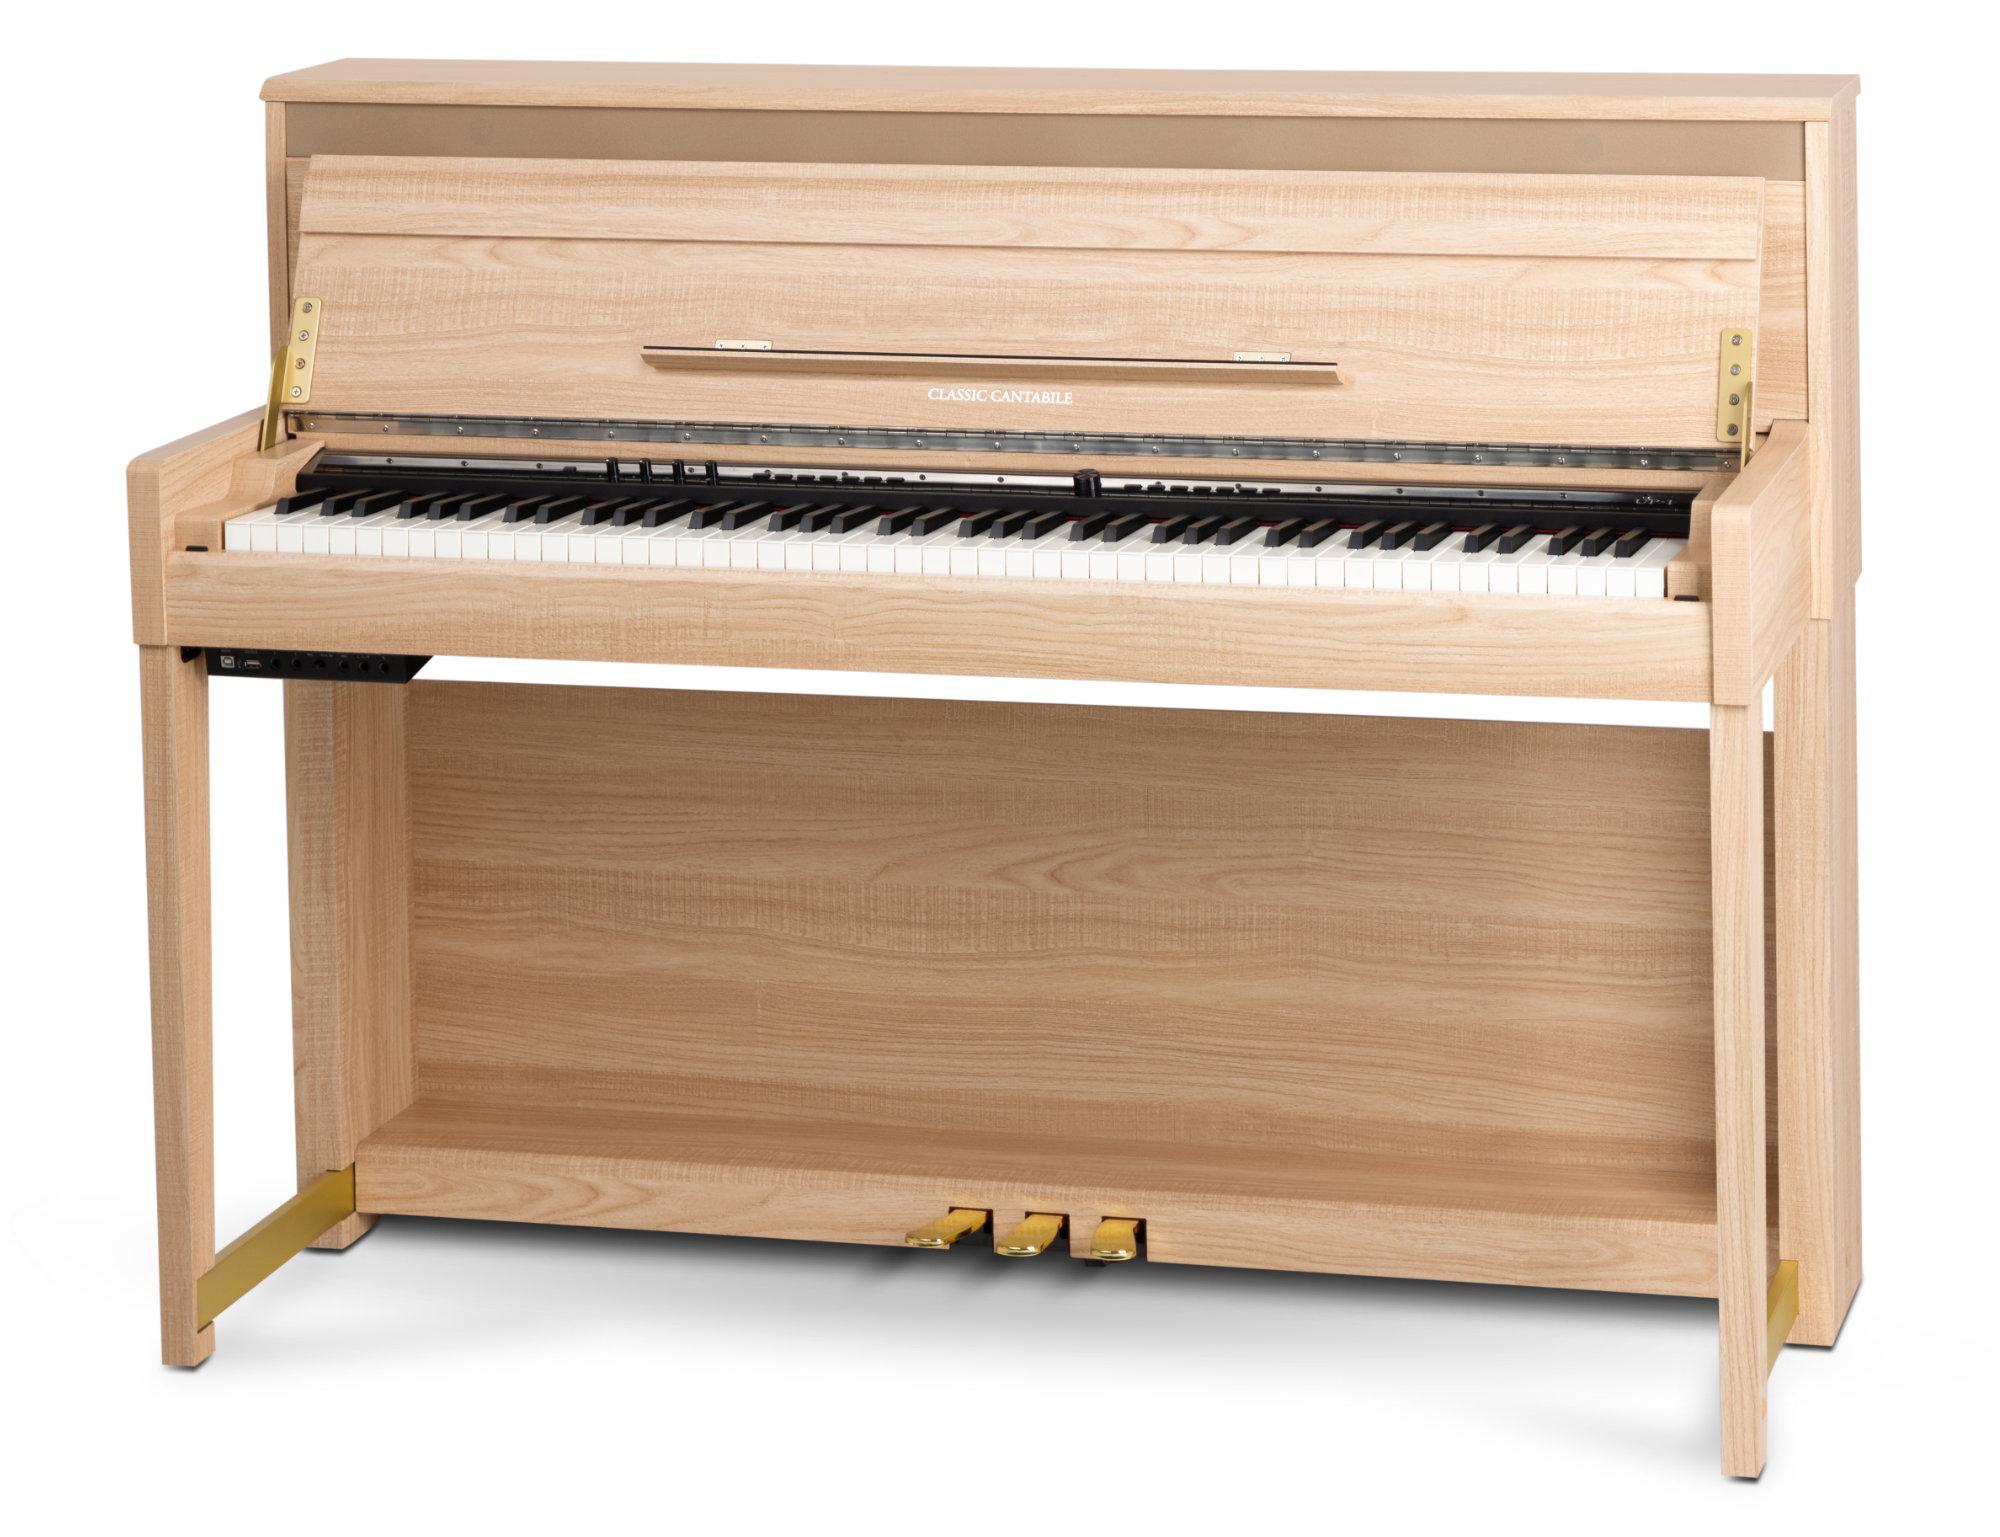 Digitalpianos - Classic Cantabile UP 1 LA Upright E Piano Eiche hell - Onlineshop Musikhaus Kirstein